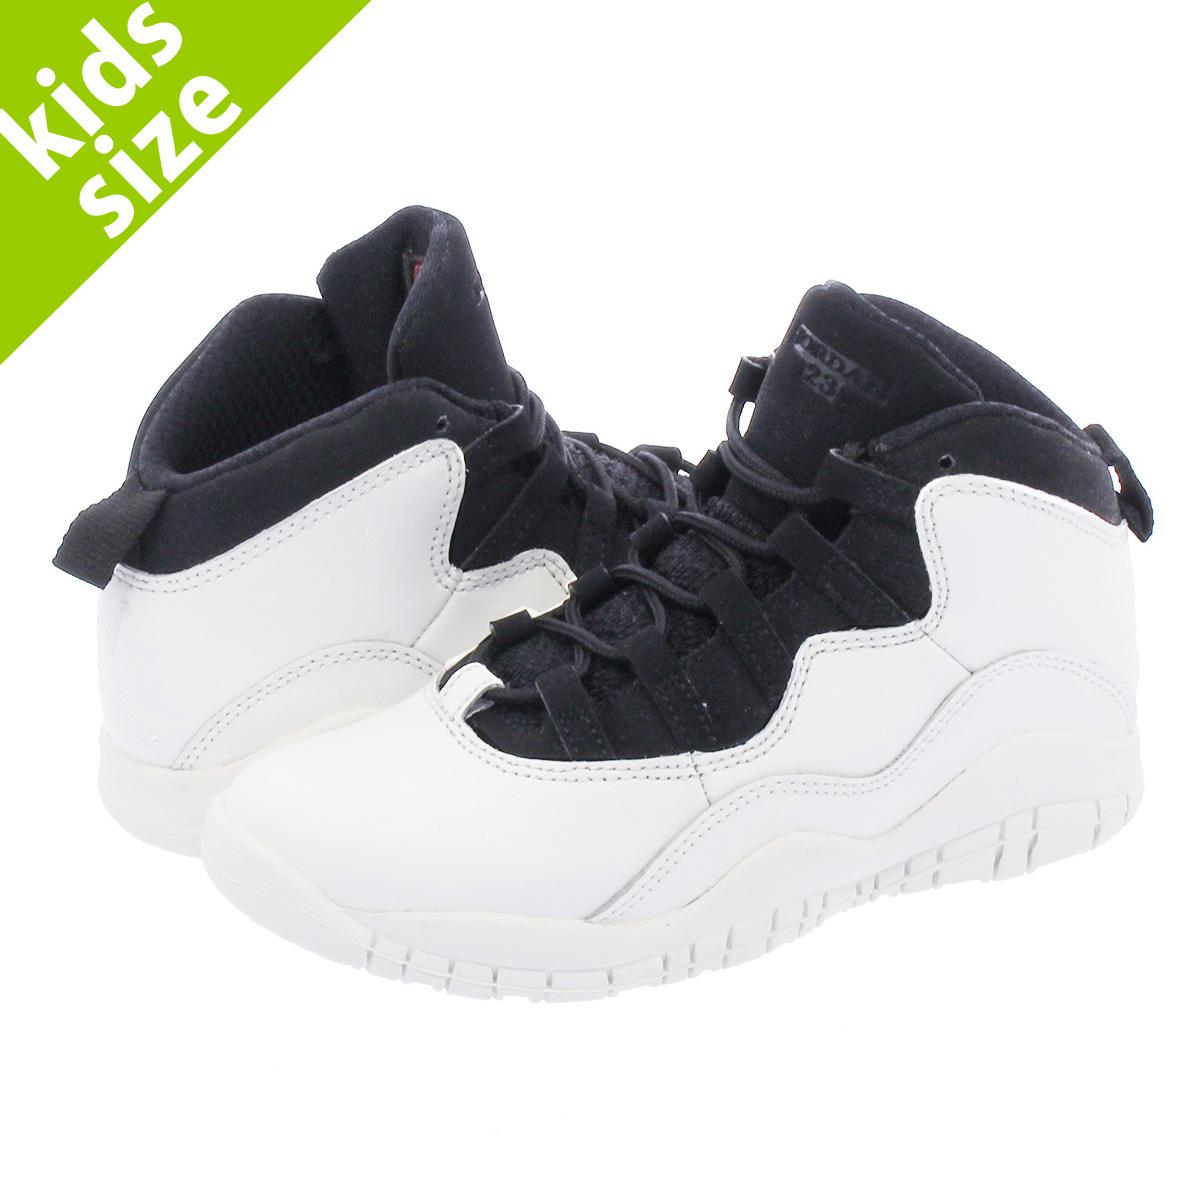 new arrival d26d7 57462 NIKE AIR JORDAN 10 RETRO BP Nike Air Jordan 10 nostalgic BP SUMMIT  WHITE/BLACK 310,807-104